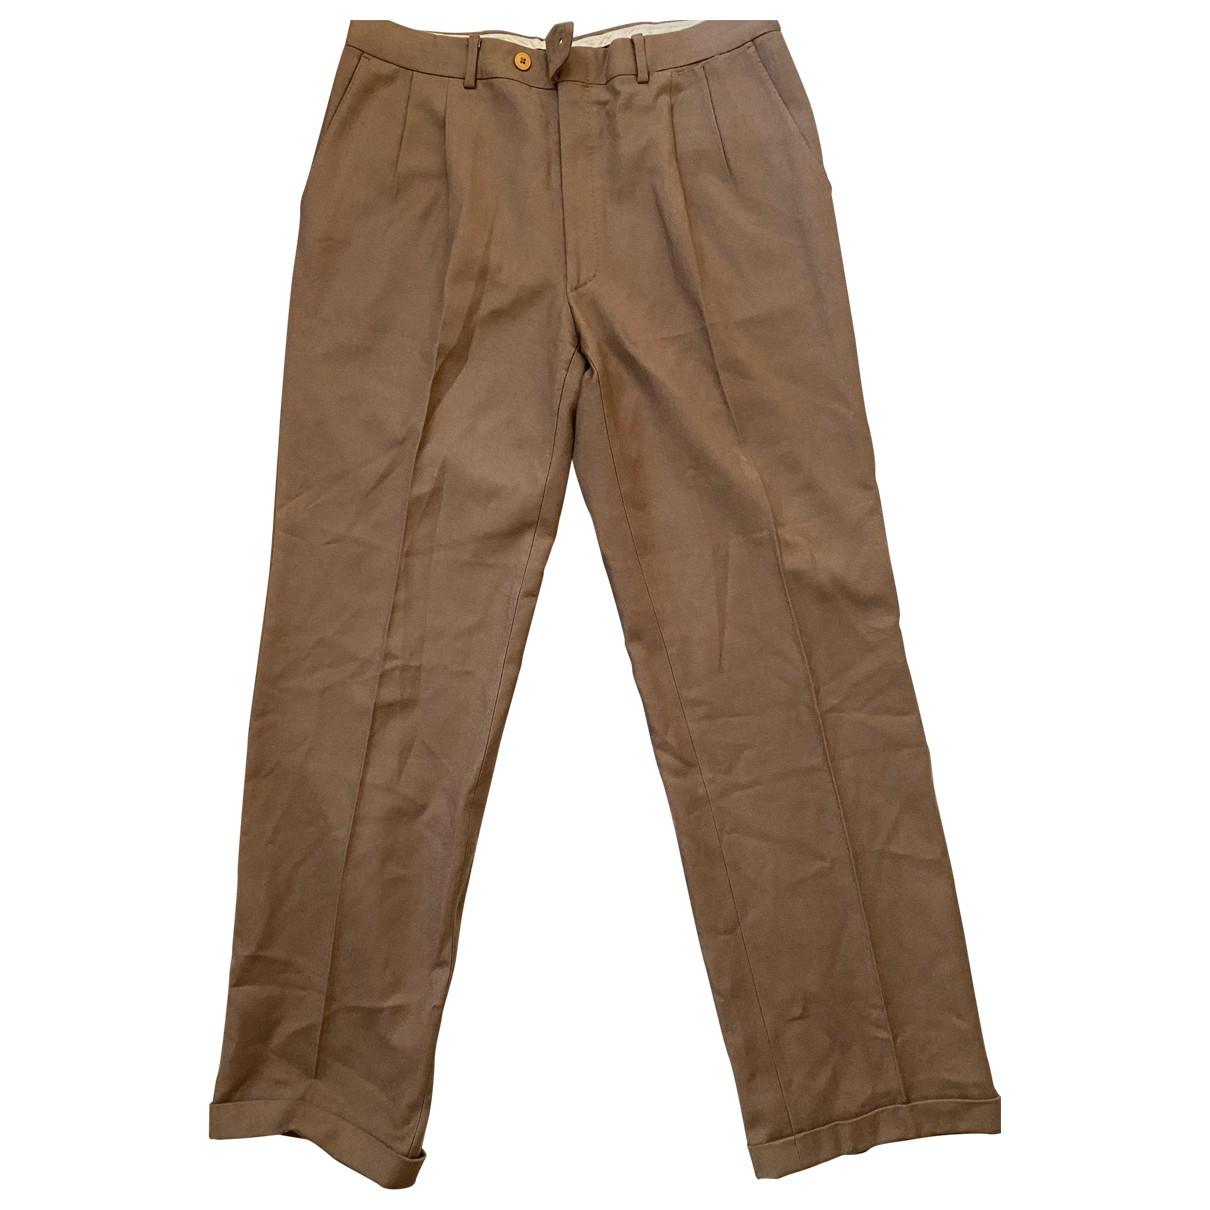 Saint Laurent \N Camel Wool Trousers for Men M International